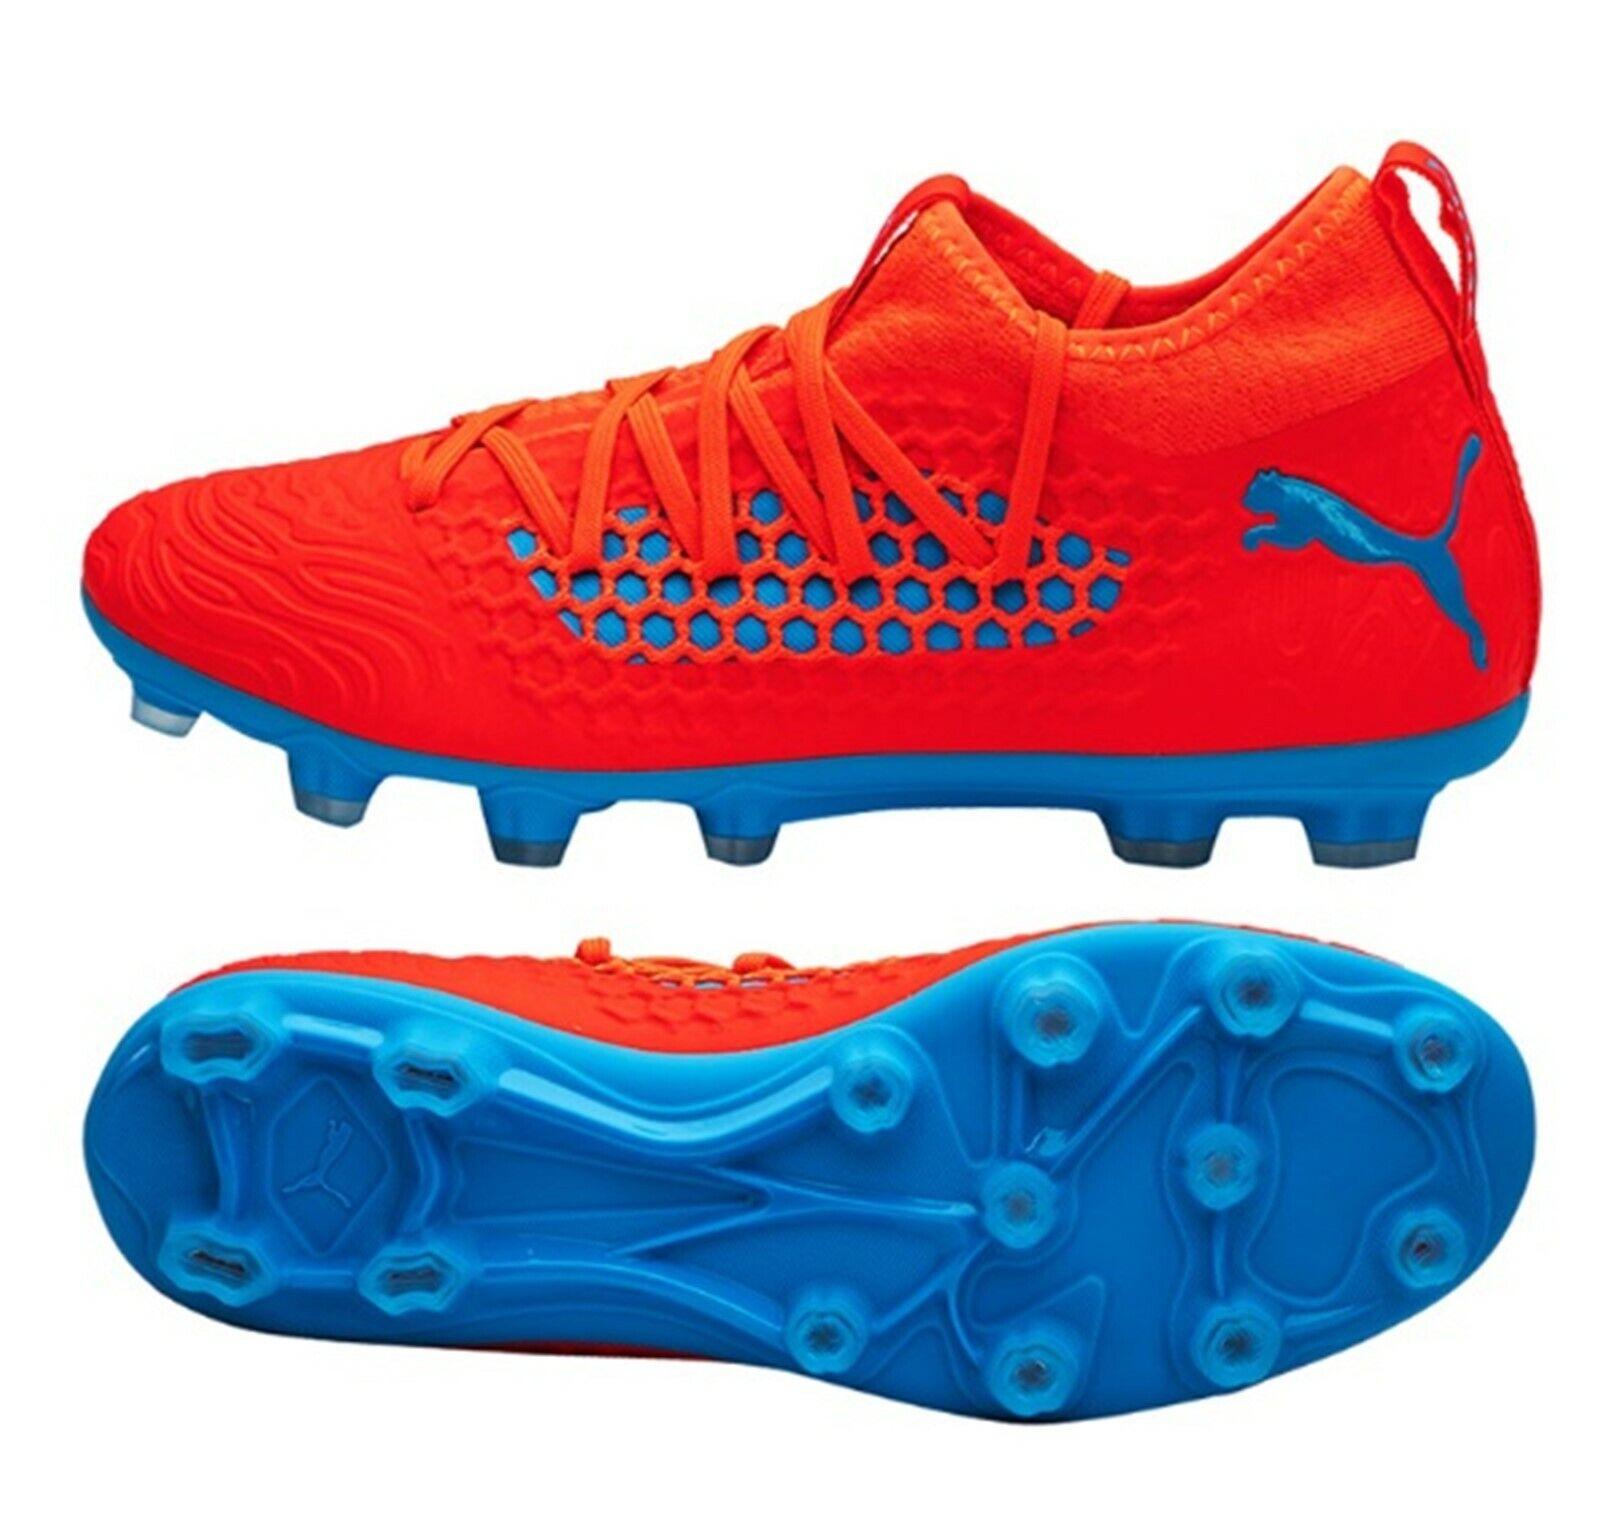 Puma para hombre futuro 19.3 Hg Net-Fit Tacos rojo Zapatos deportivos de fútbol inicio Spike 10554001